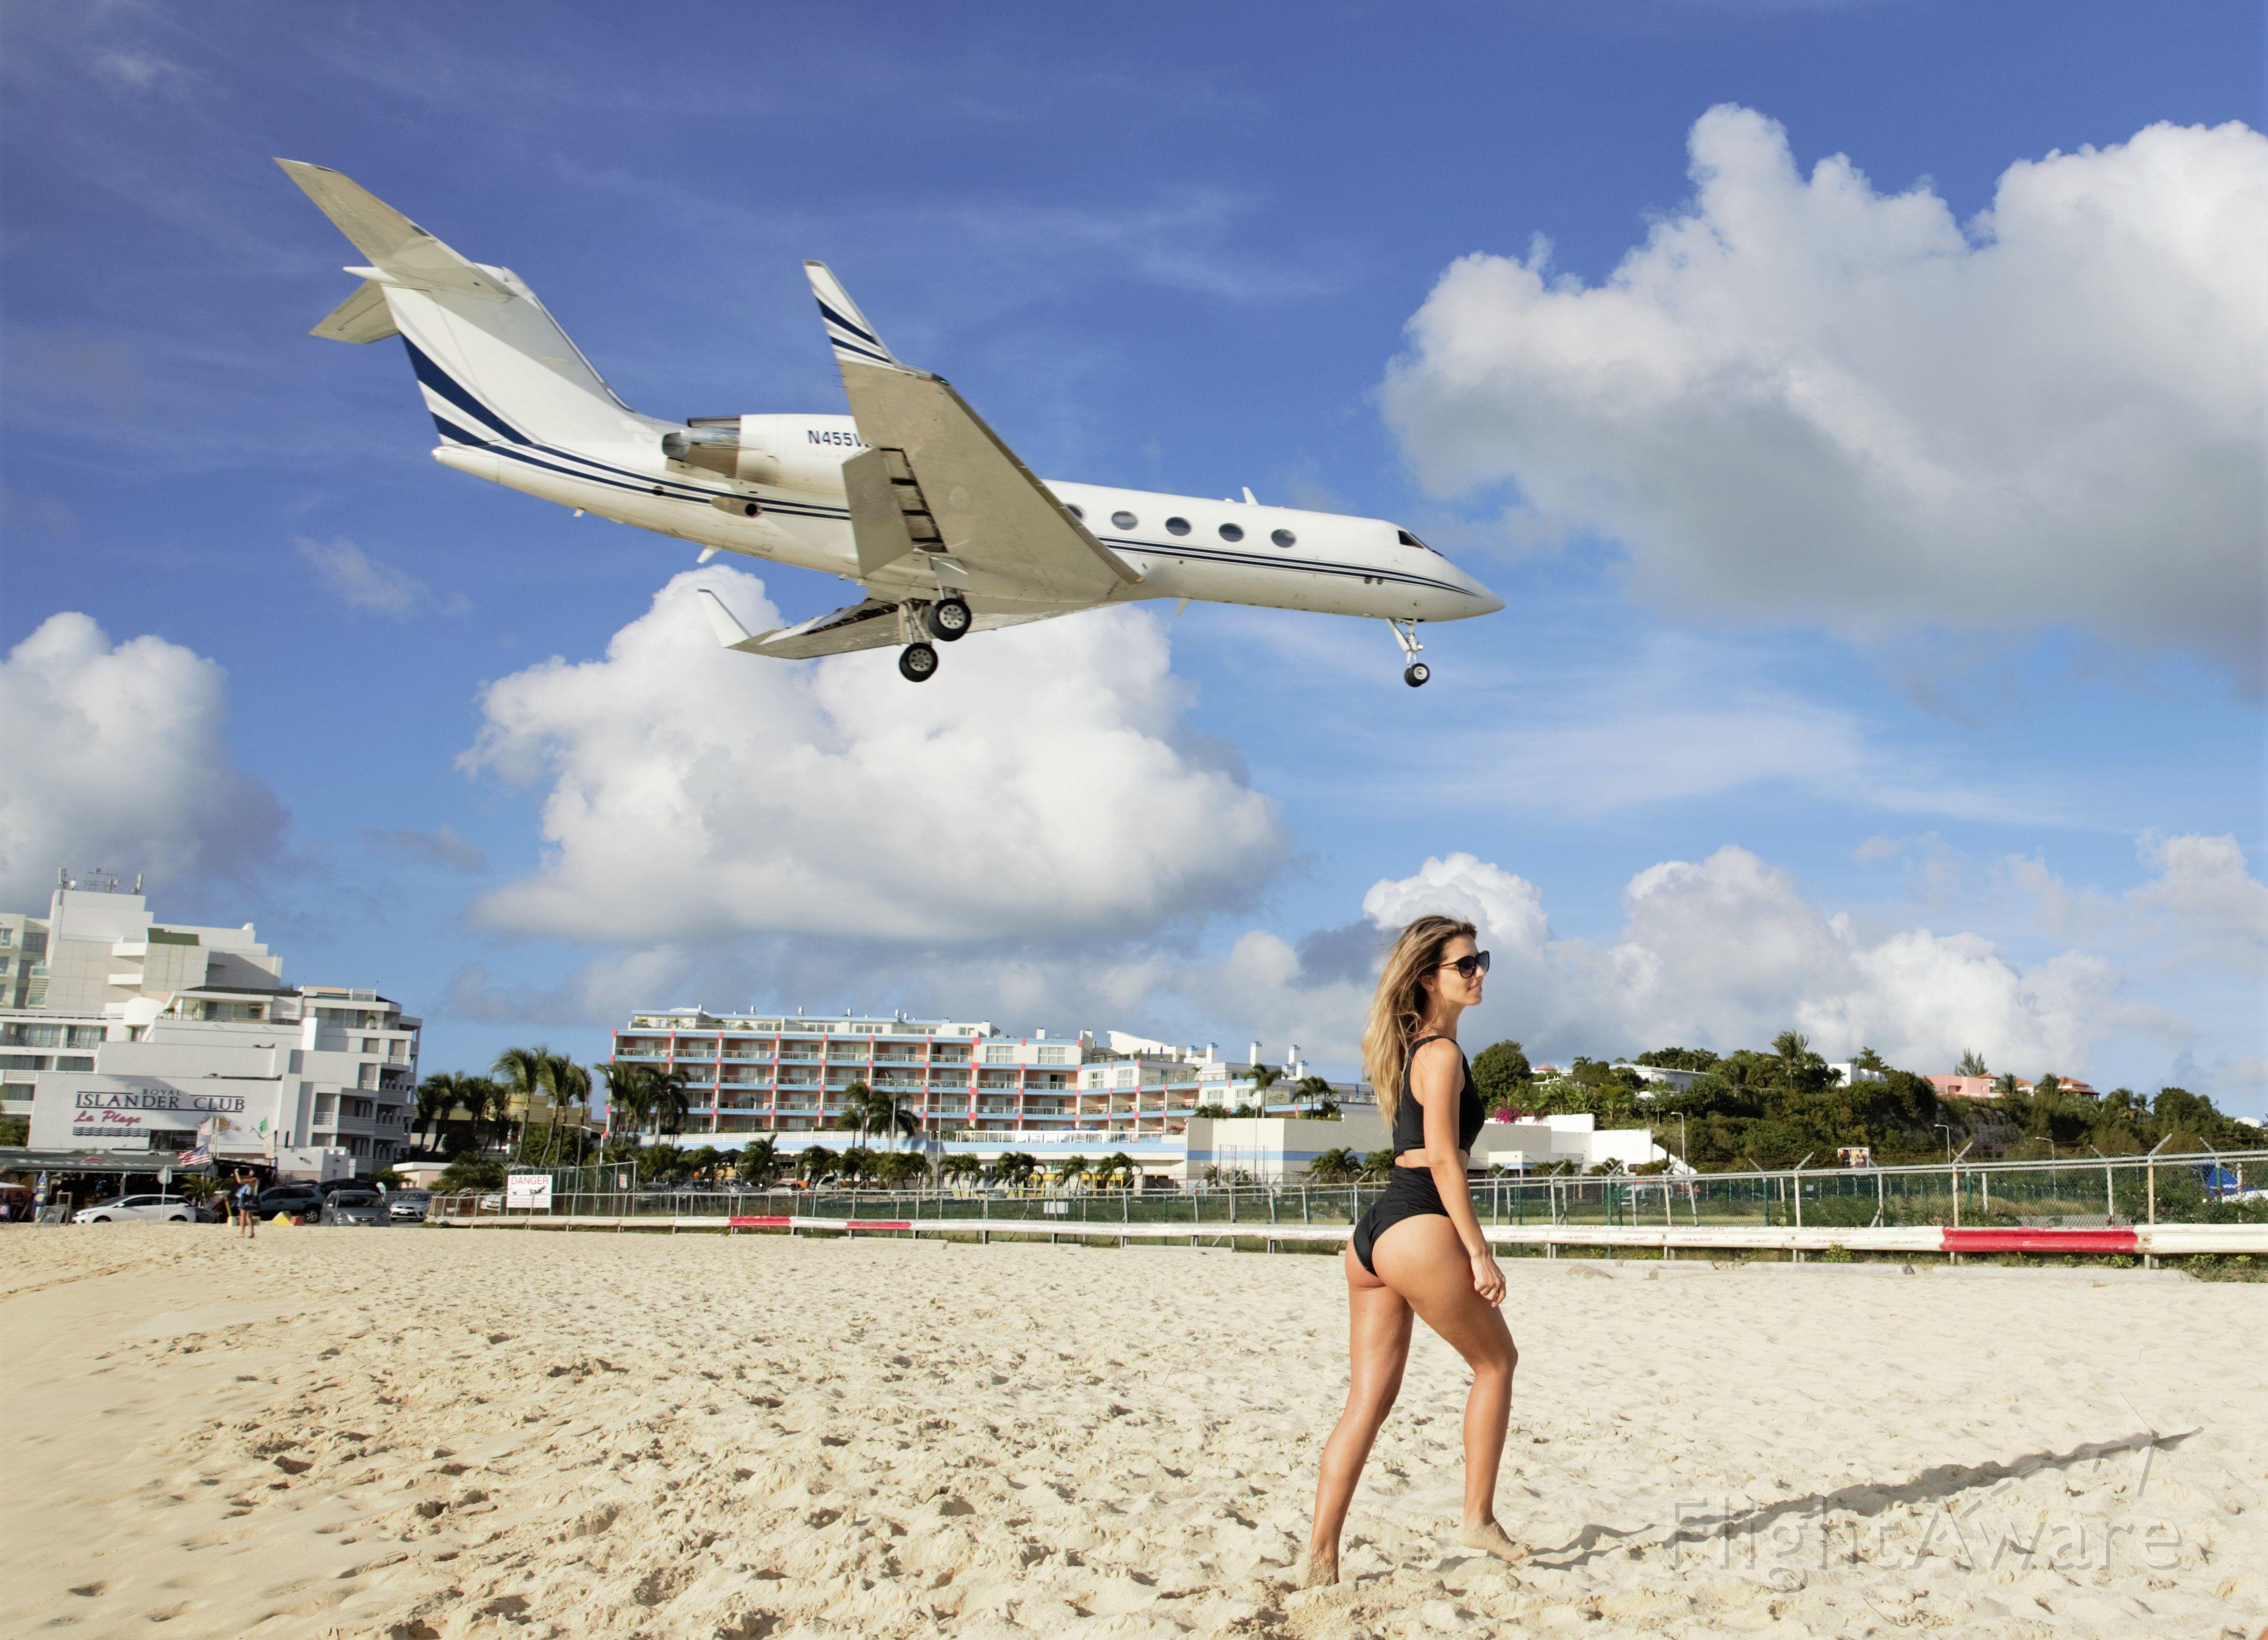 Gulfstream Aerospace Gulfstream IV (N455WG) - Girls and airplanes makes the day!